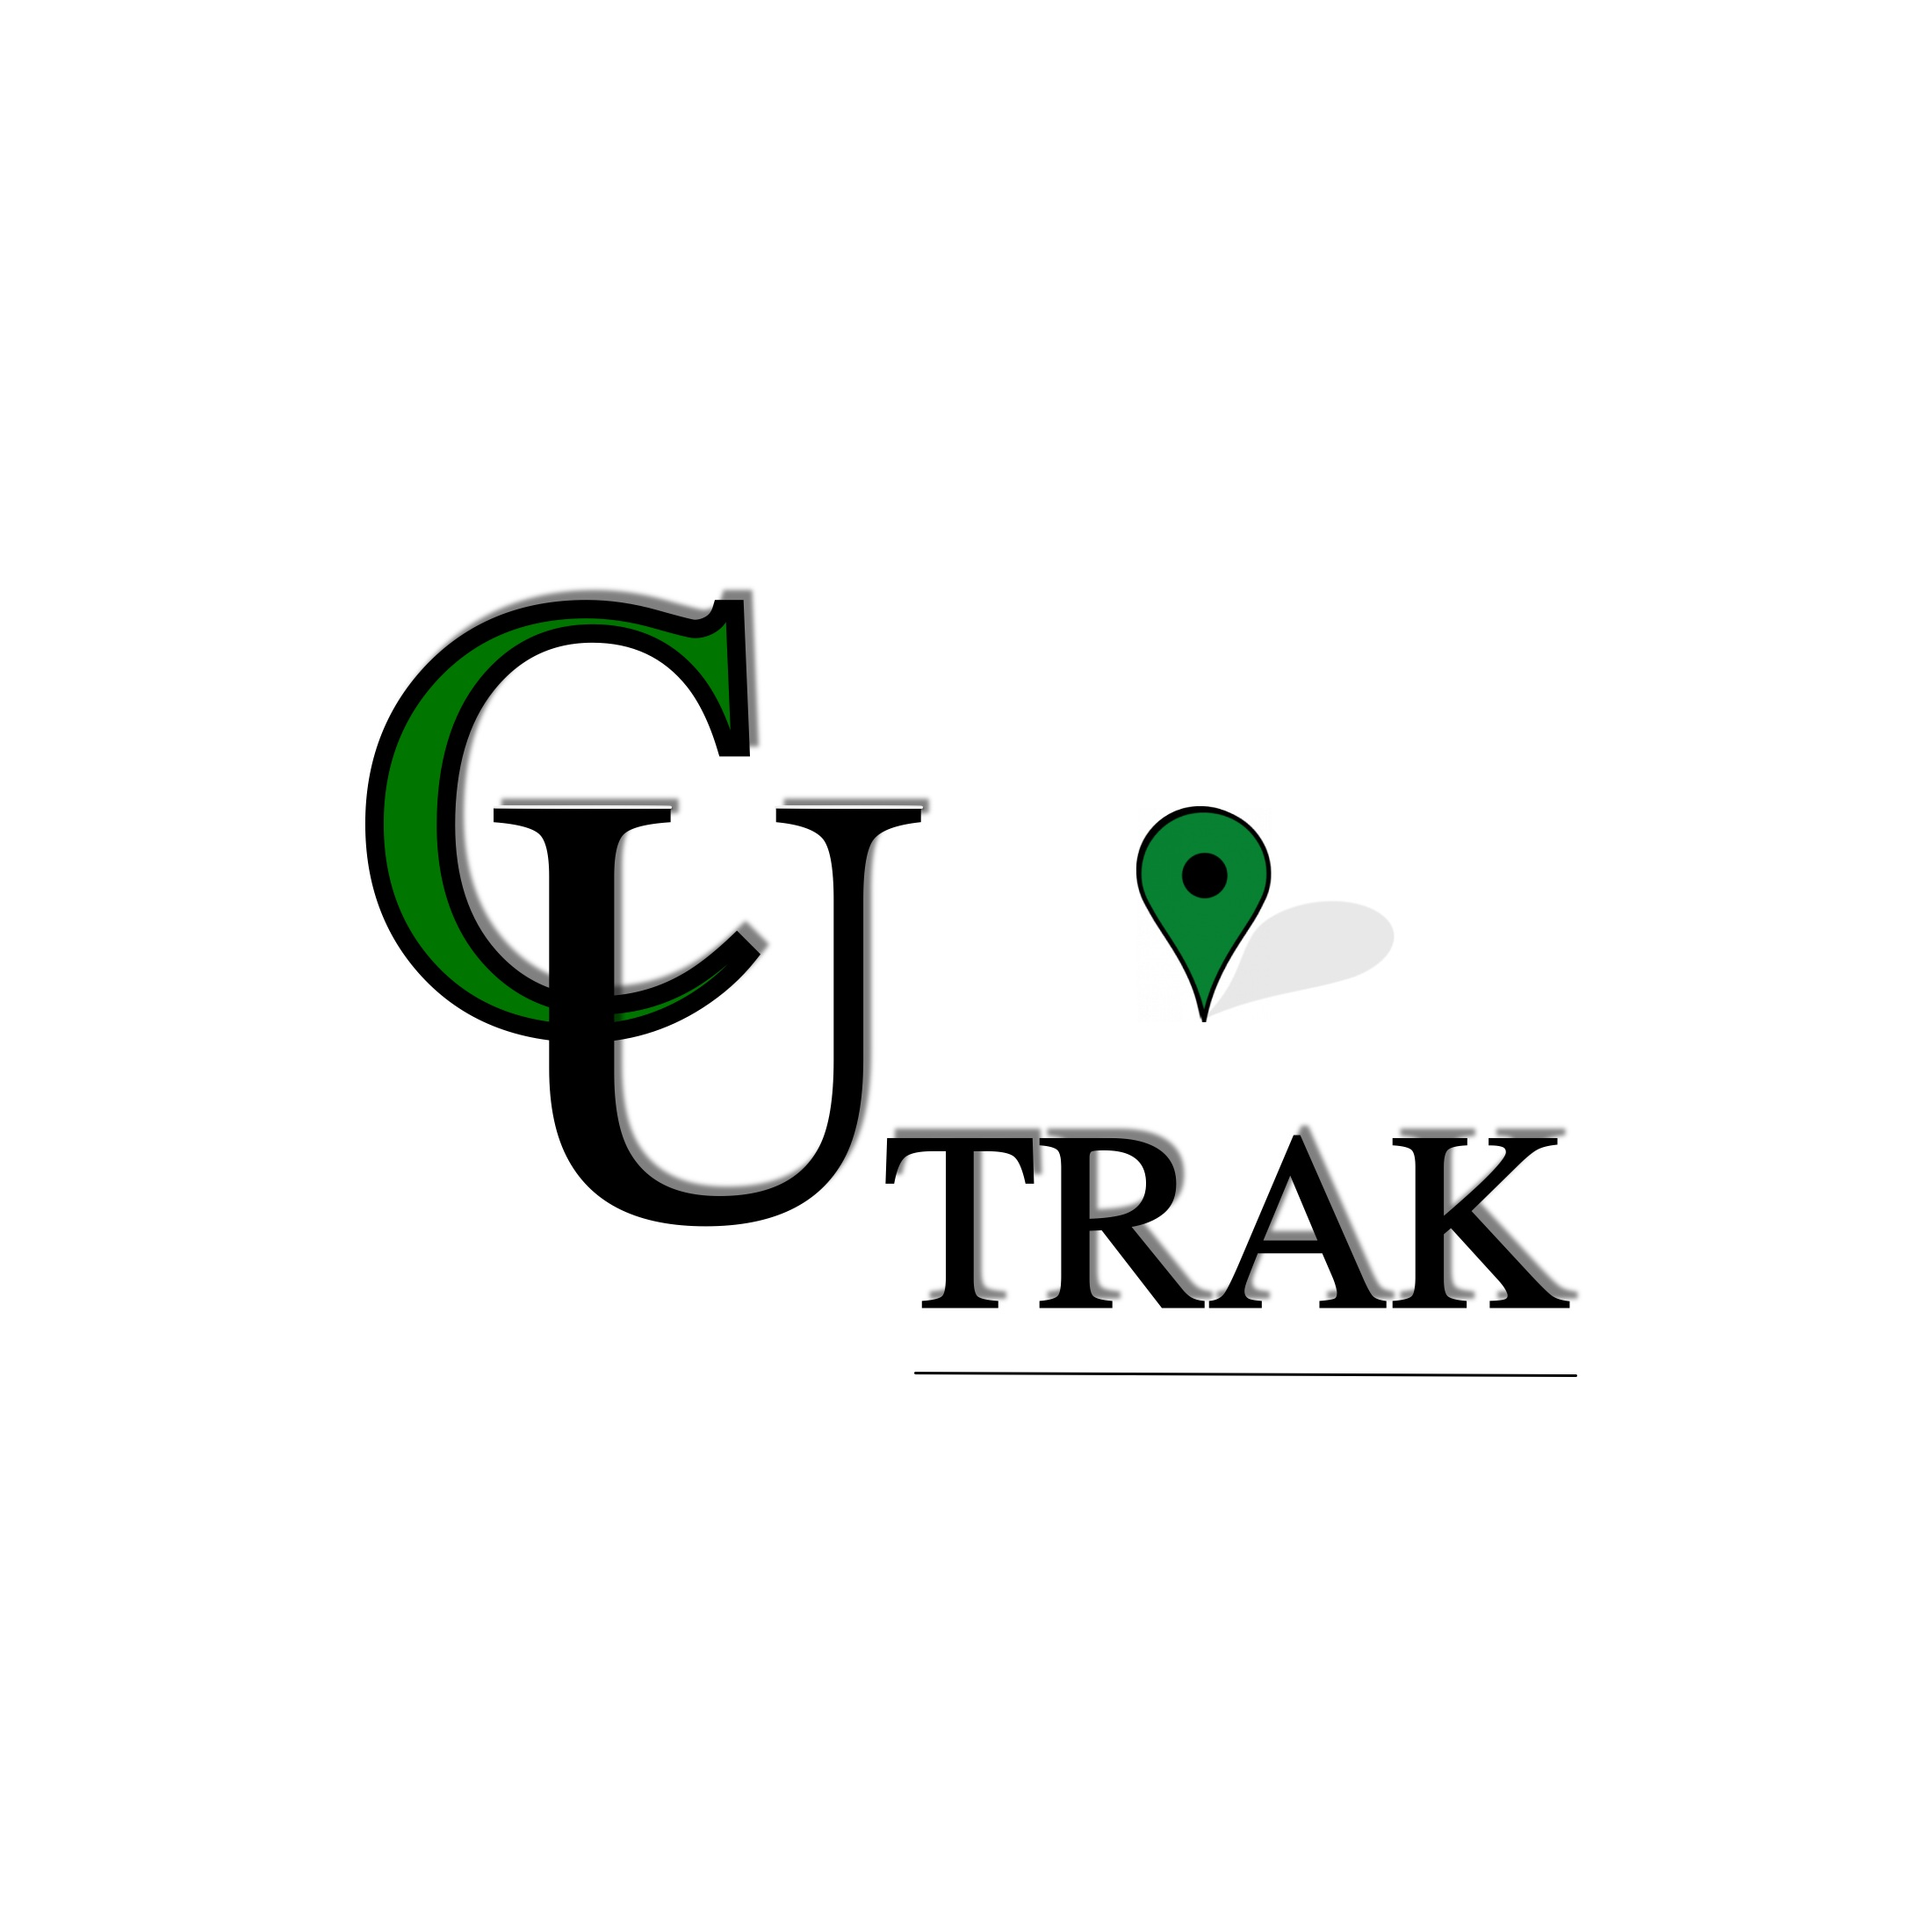 CU Trak logo